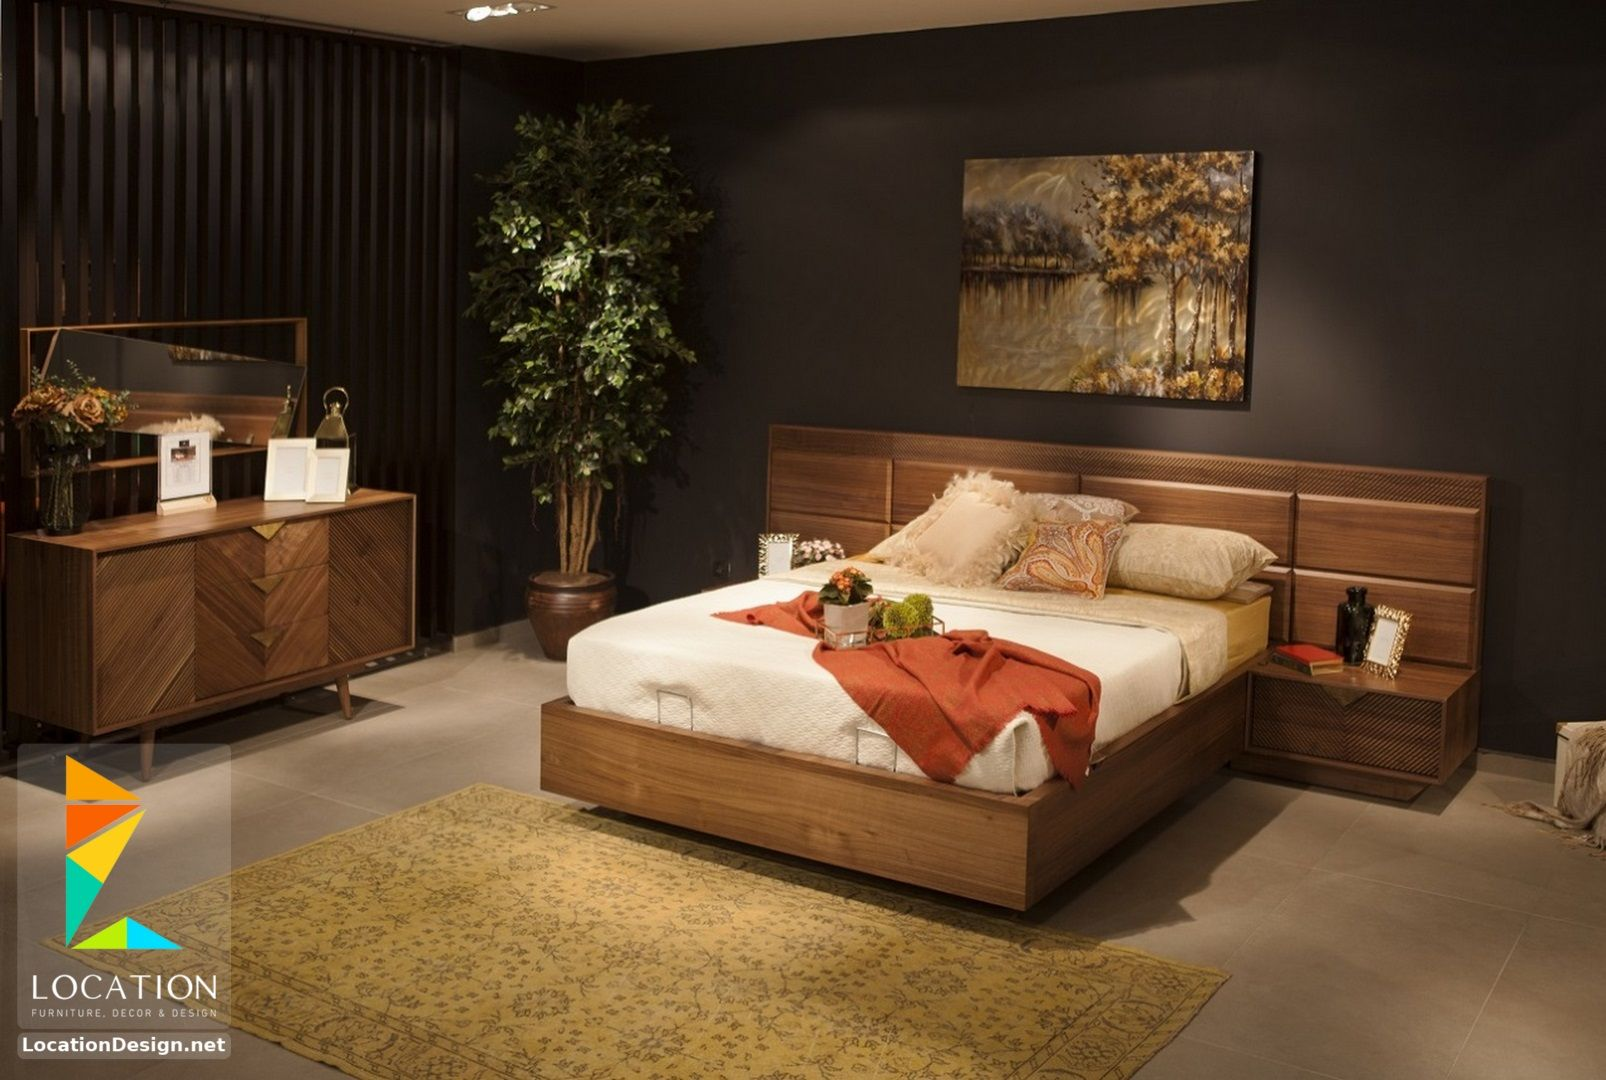 احدث موديلات و اشكال غرف نوم تركي 2019 2020 Home Home Decor Room